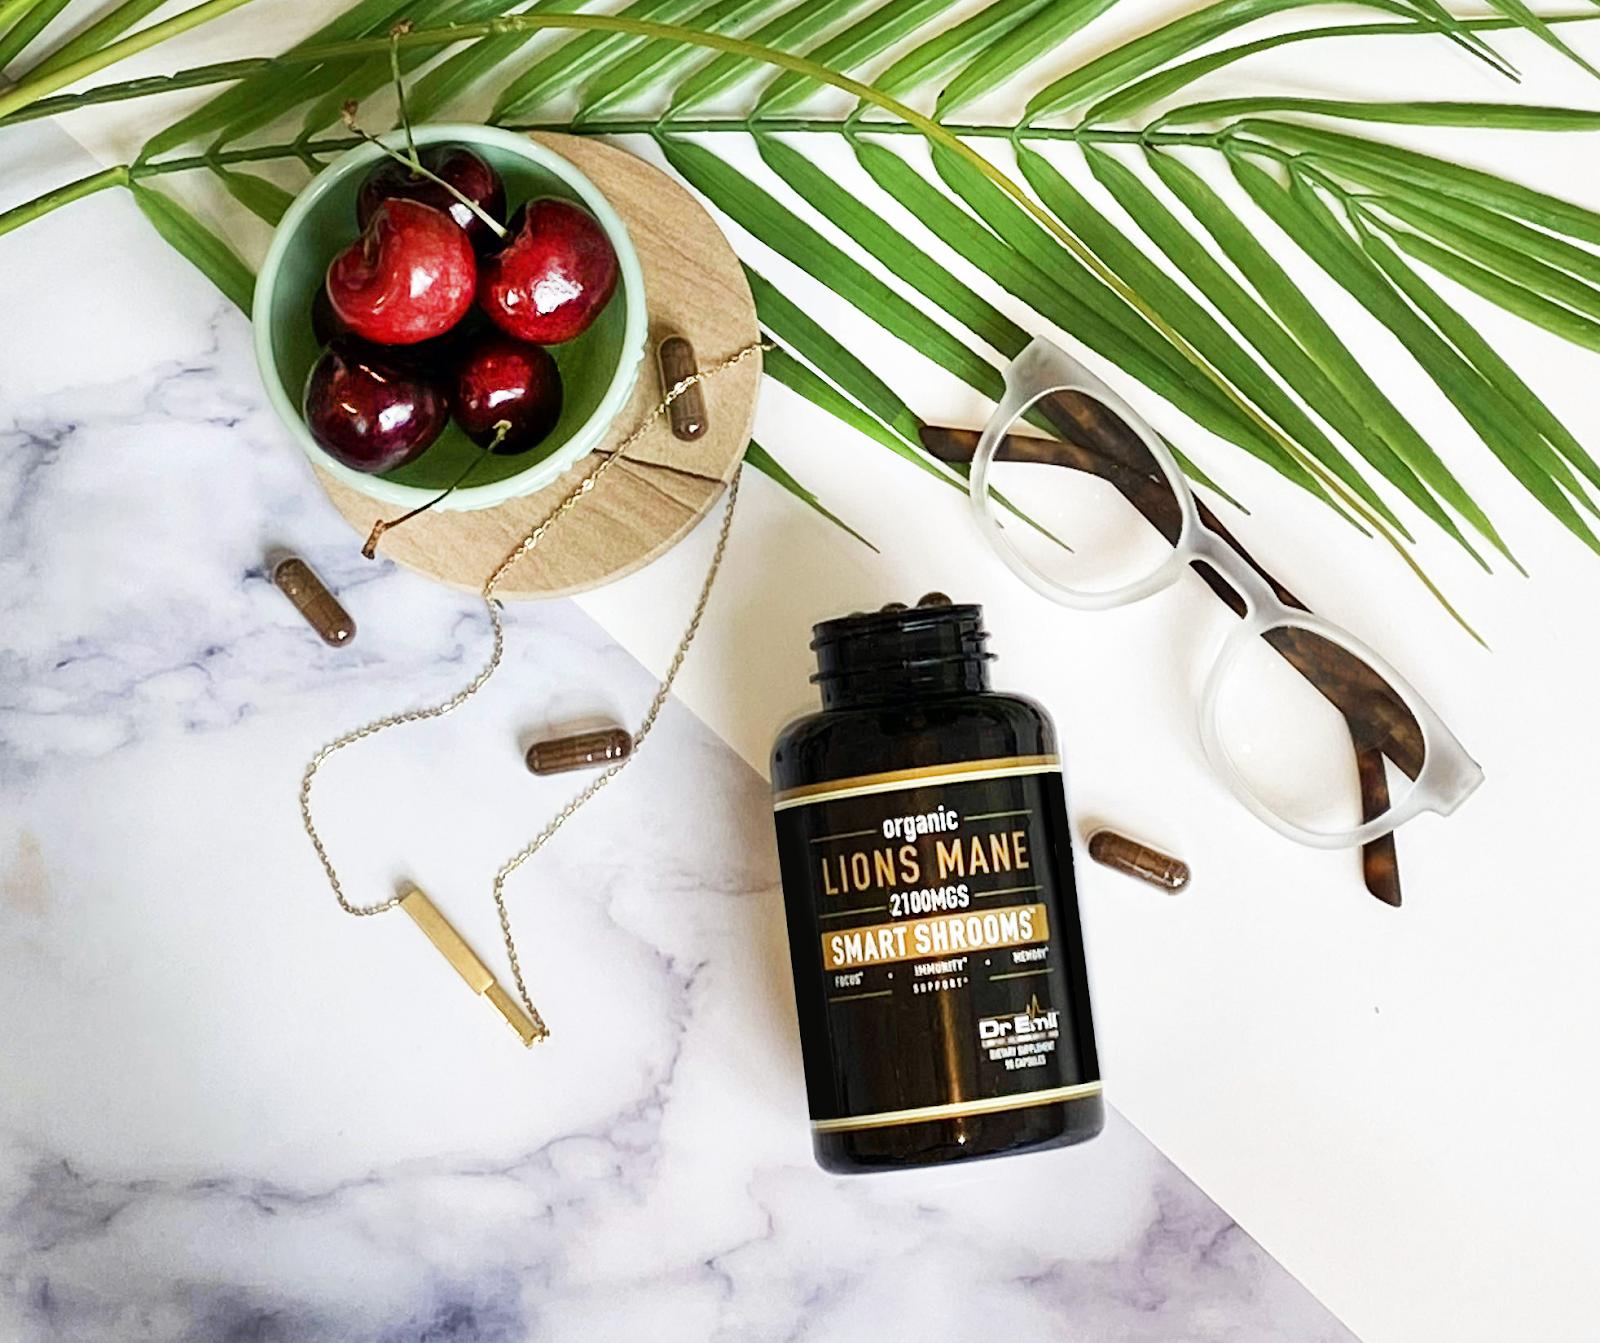 Dr. Emil Nutrition's lion's mane supplement